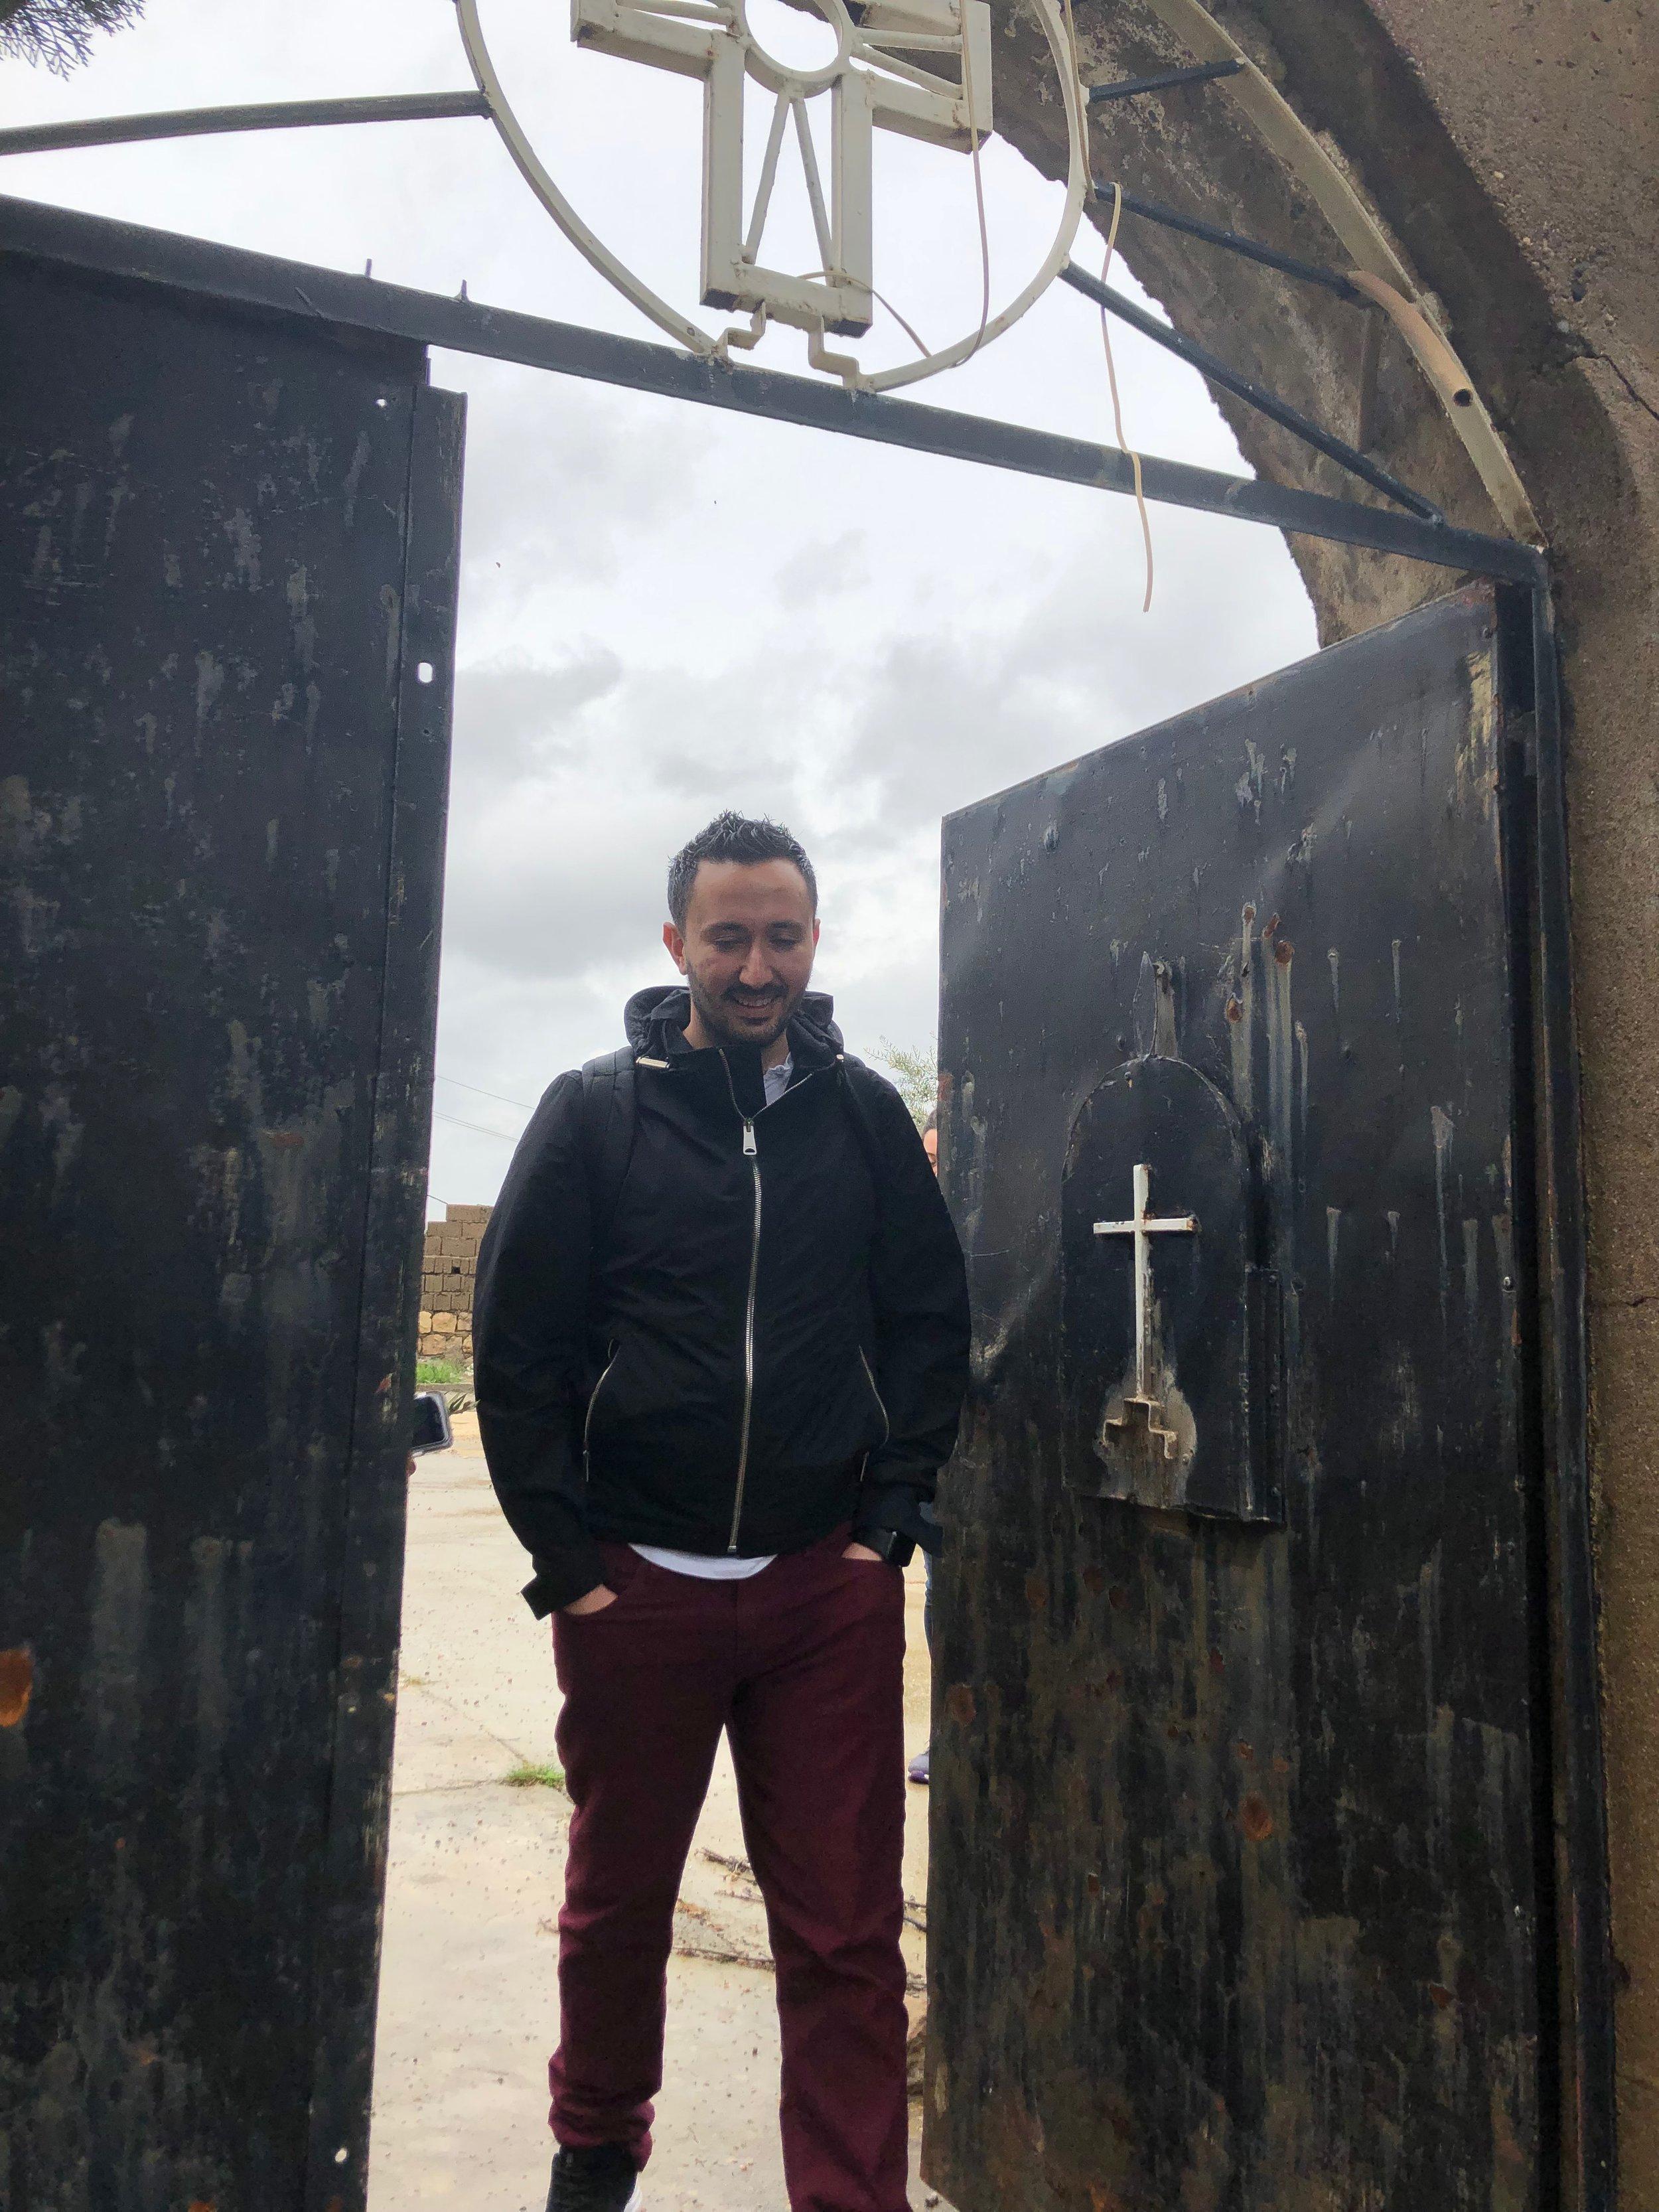 Chris Salem, 29, Farmington Hills